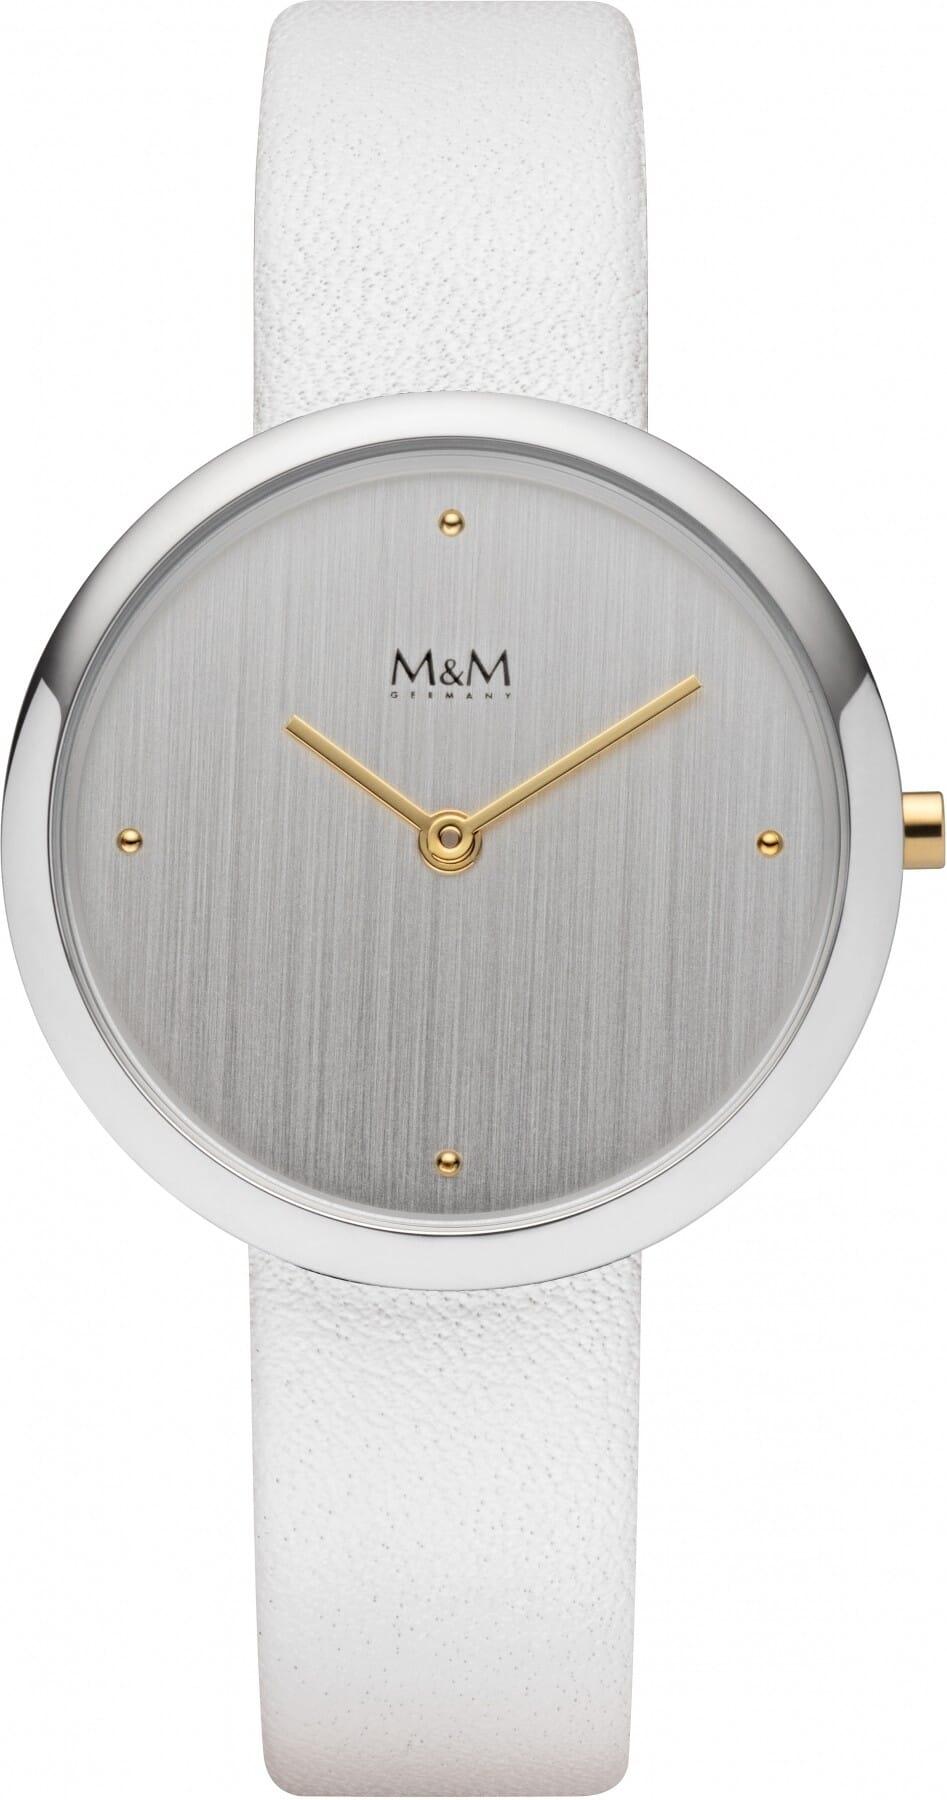 MM Germany M11944-762